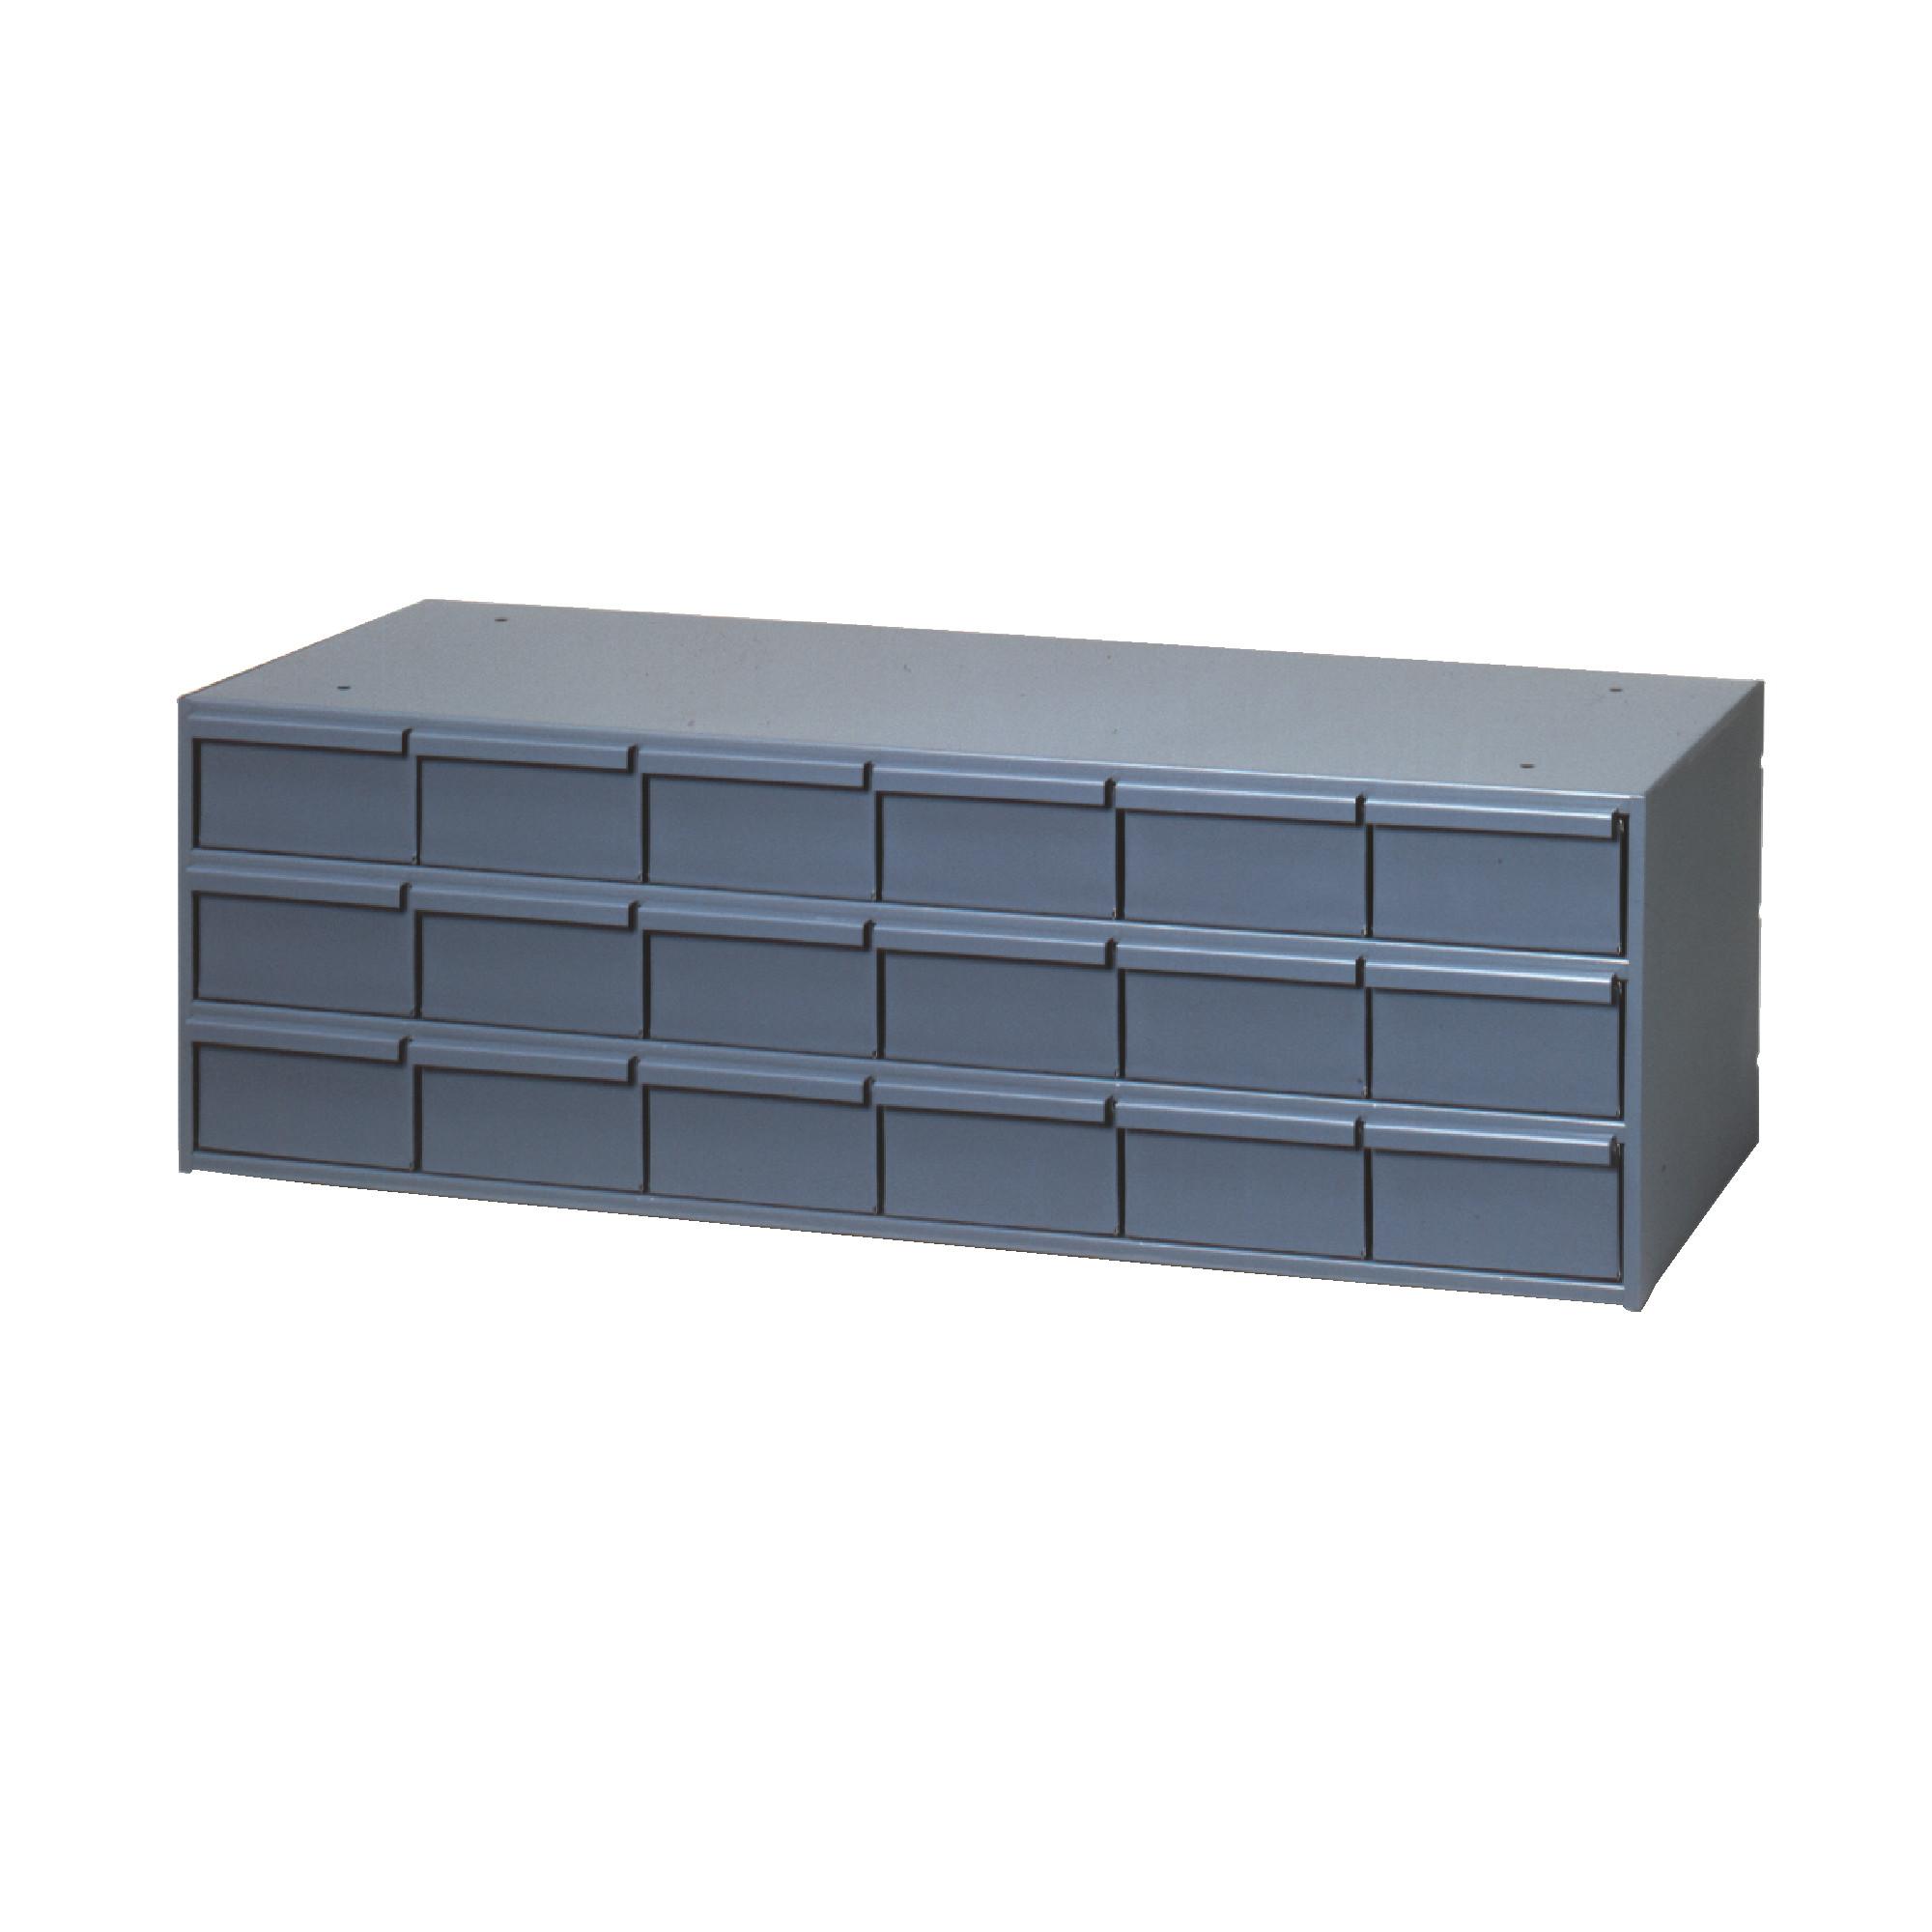 Modular All Steel Drawer Cabinets